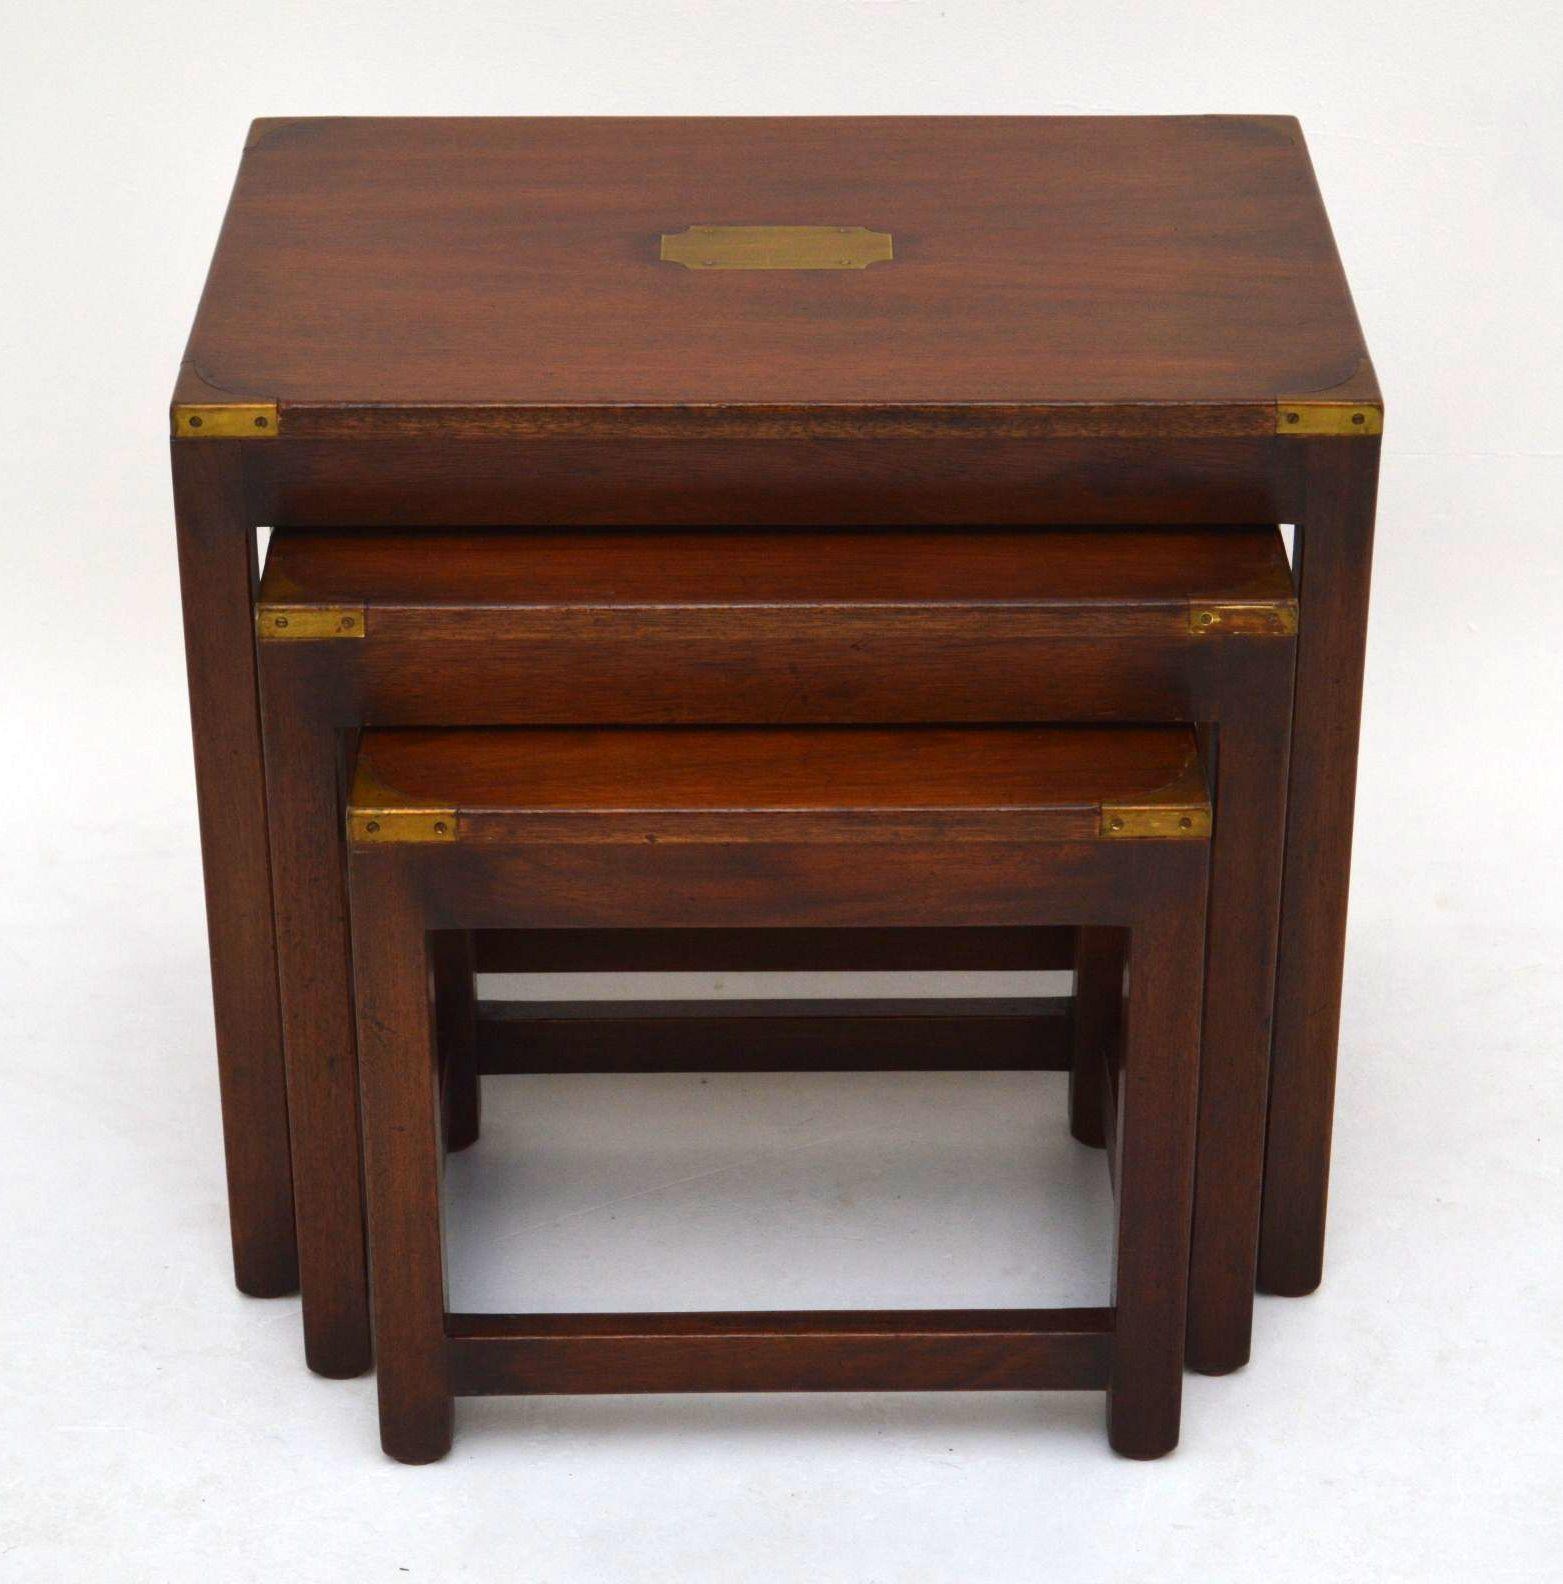 beistelltische antik campaign stil. Black Bedroom Furniture Sets. Home Design Ideas